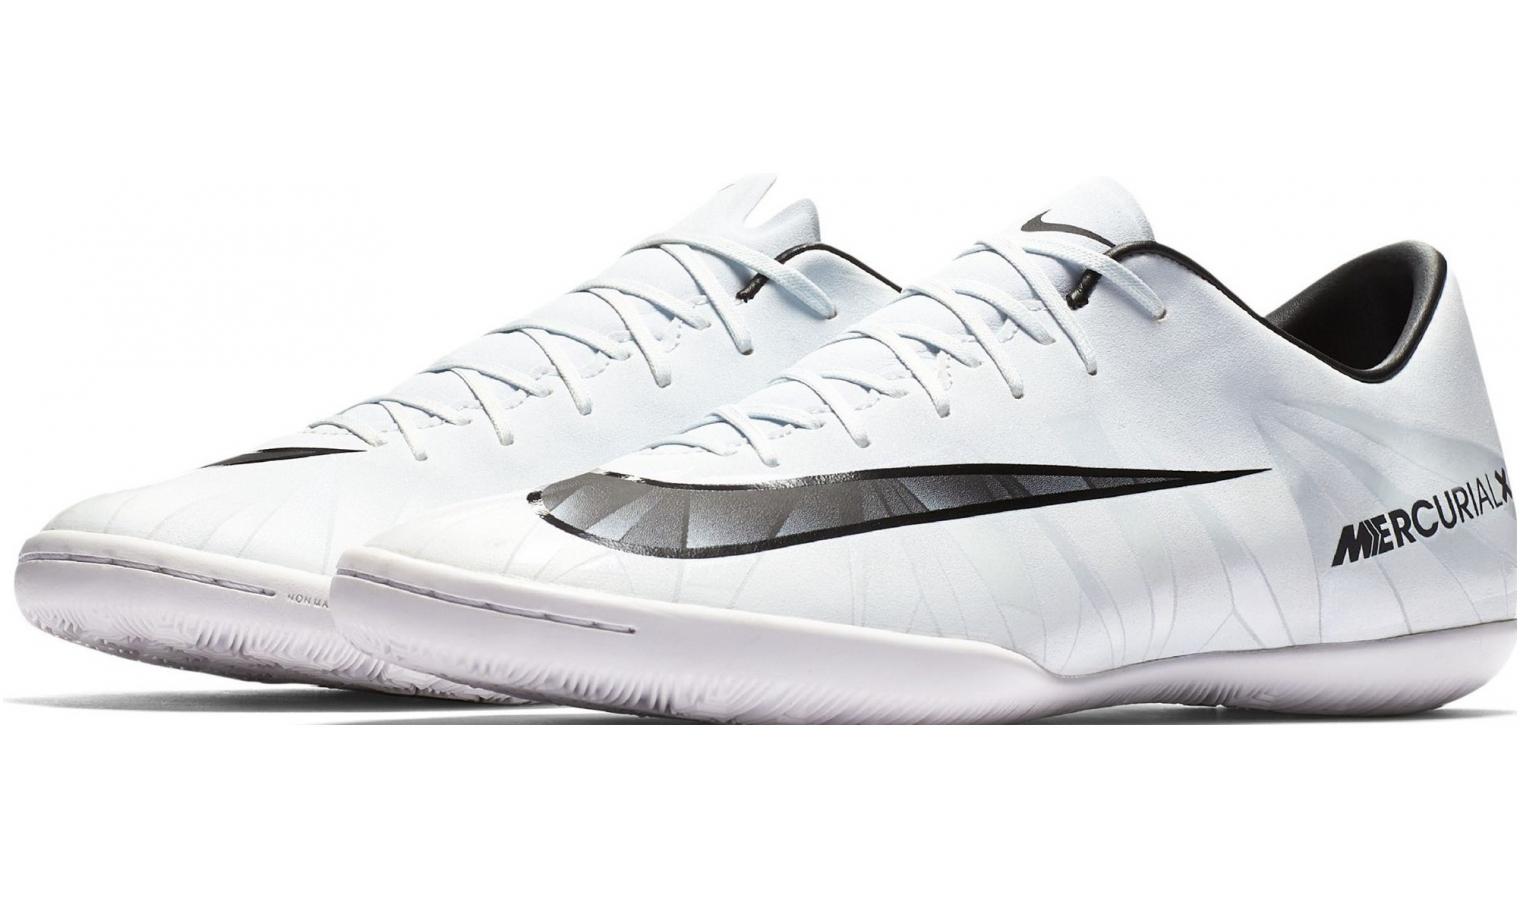 Halovky Nike MERCURIALX VICTORY VI CR7 IC biele  071ddd4f474